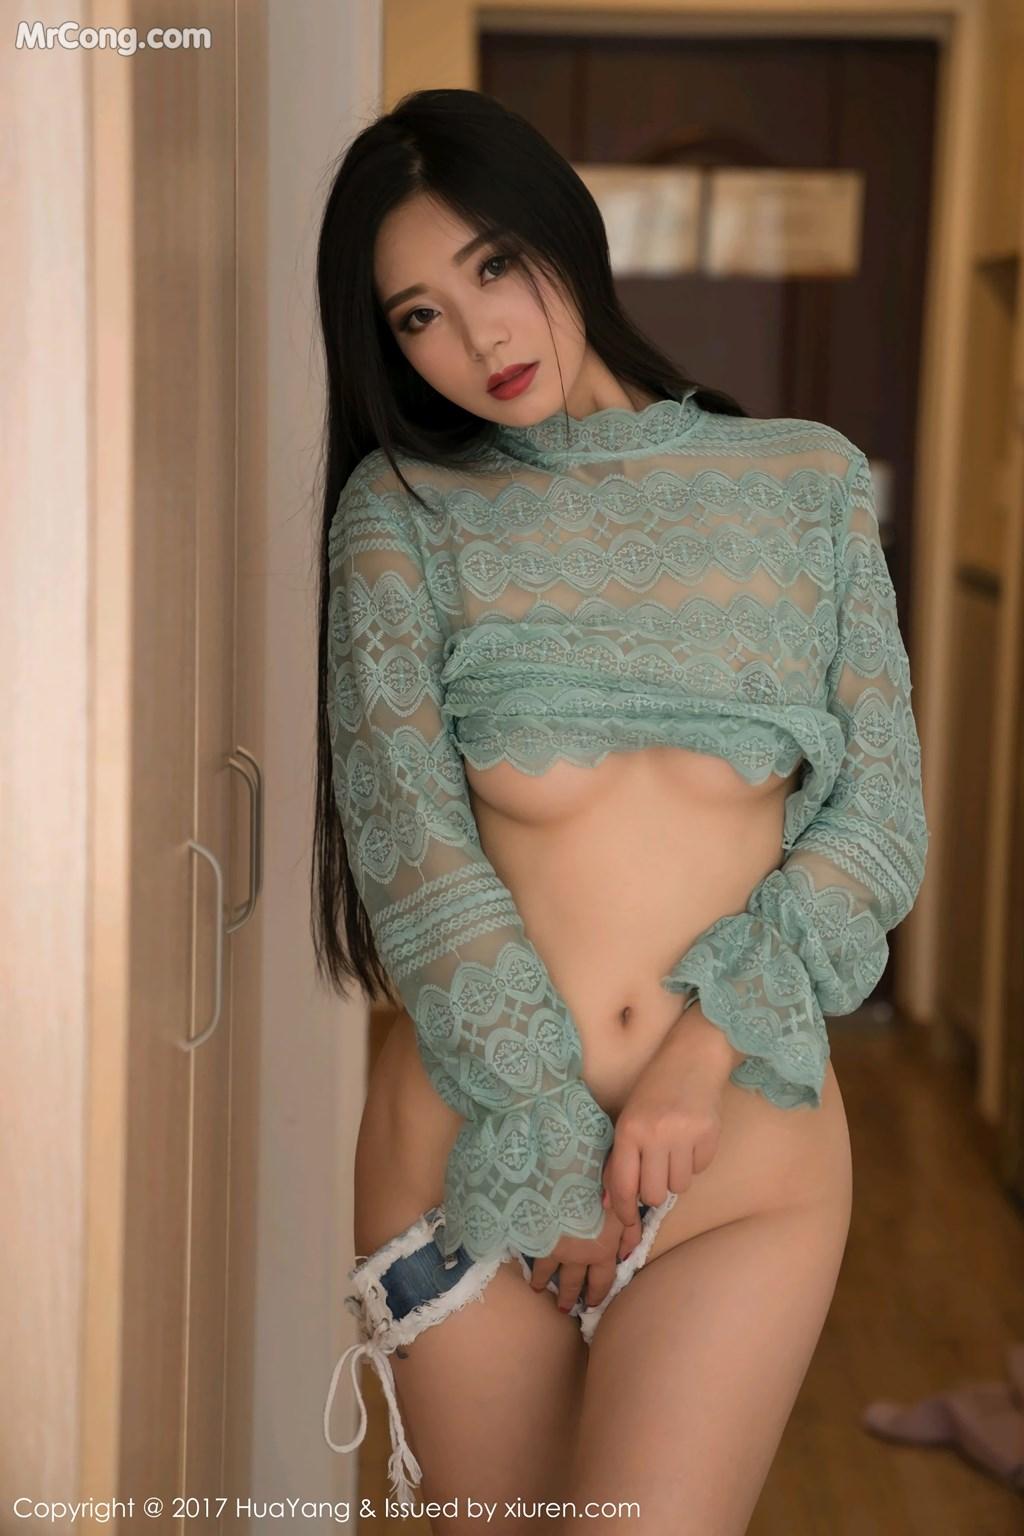 Image HuaYang-2017-11-10-Vol.015-KiKi-MrCong.com-042 in post HuaYang 2017-11-10 Vol.015: Người mẫu 宋-KiKi (45 ảnh)